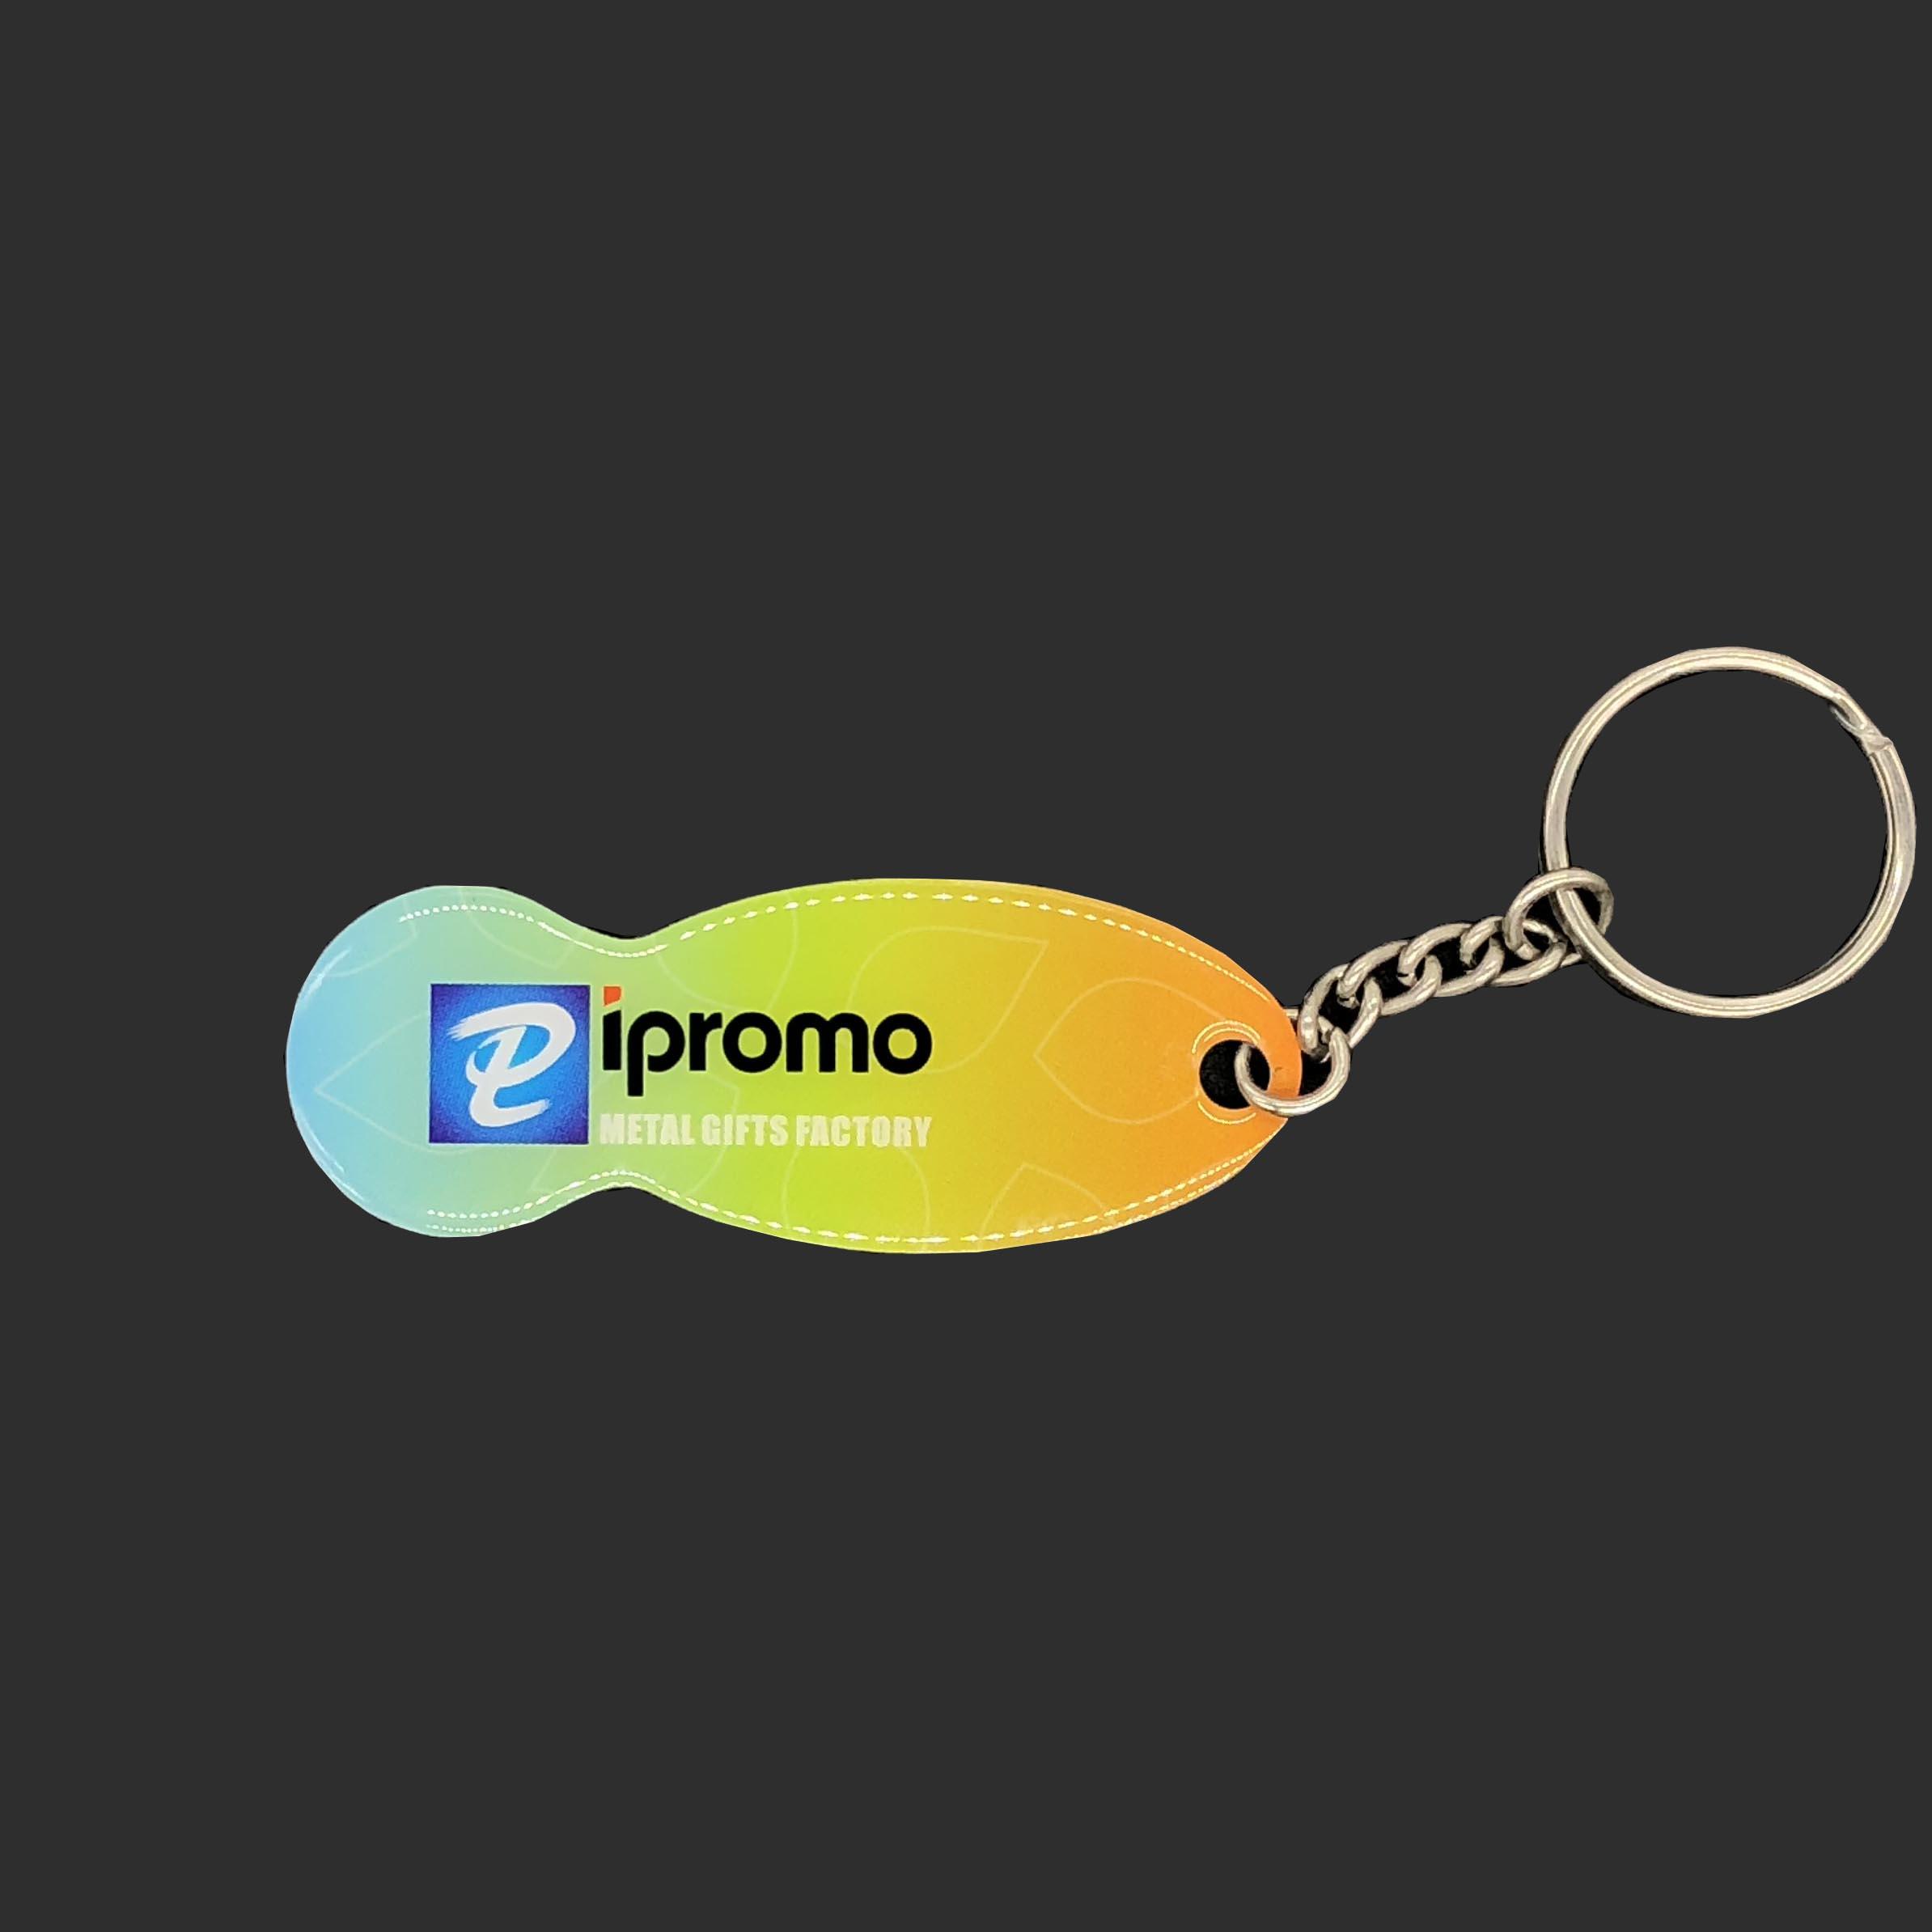 Ipromo Array image428